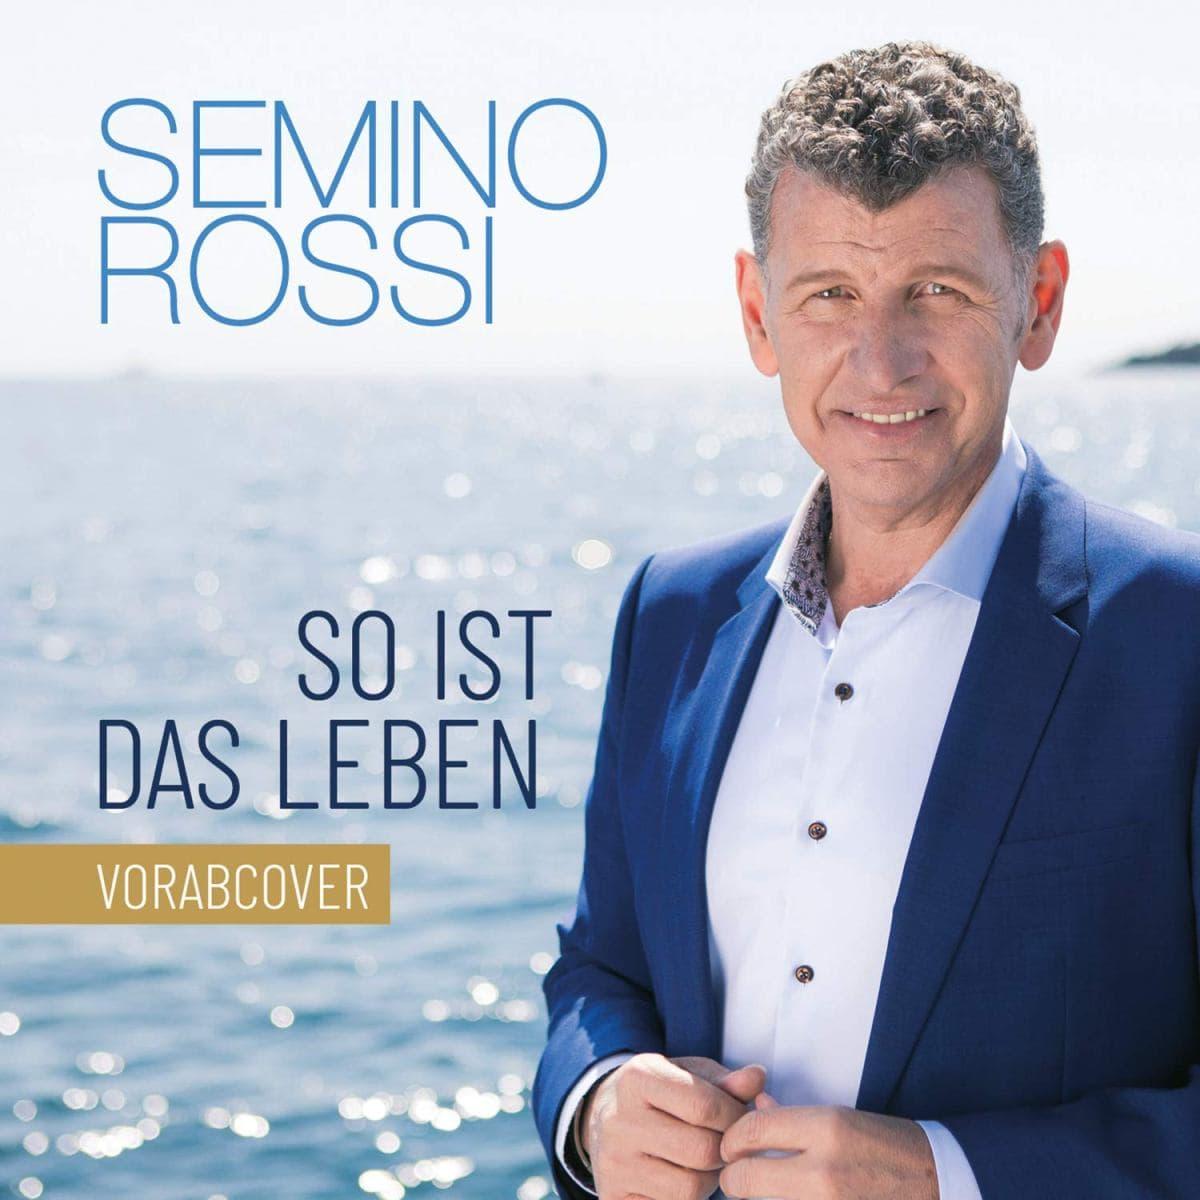 Semino Rossi 2019 CD So ist das Leben